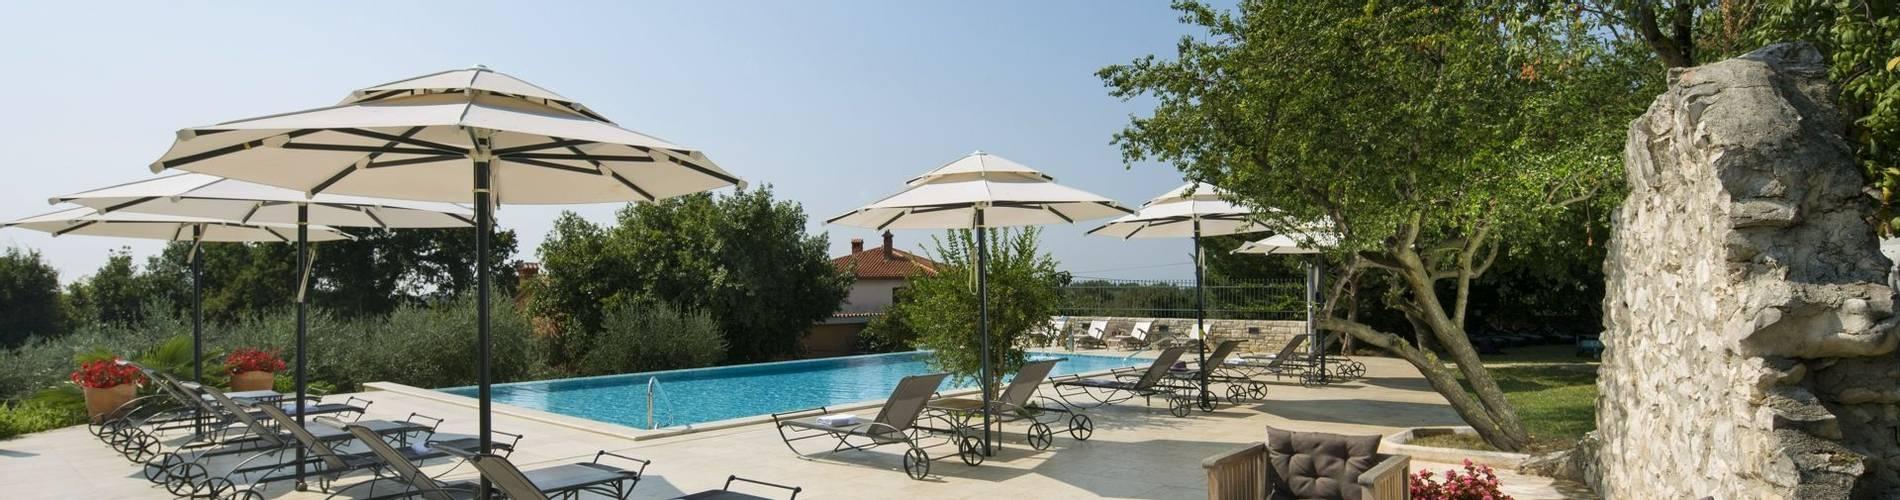 Heritage Hotel San Rocco, Istra, Croatia (15).jpg